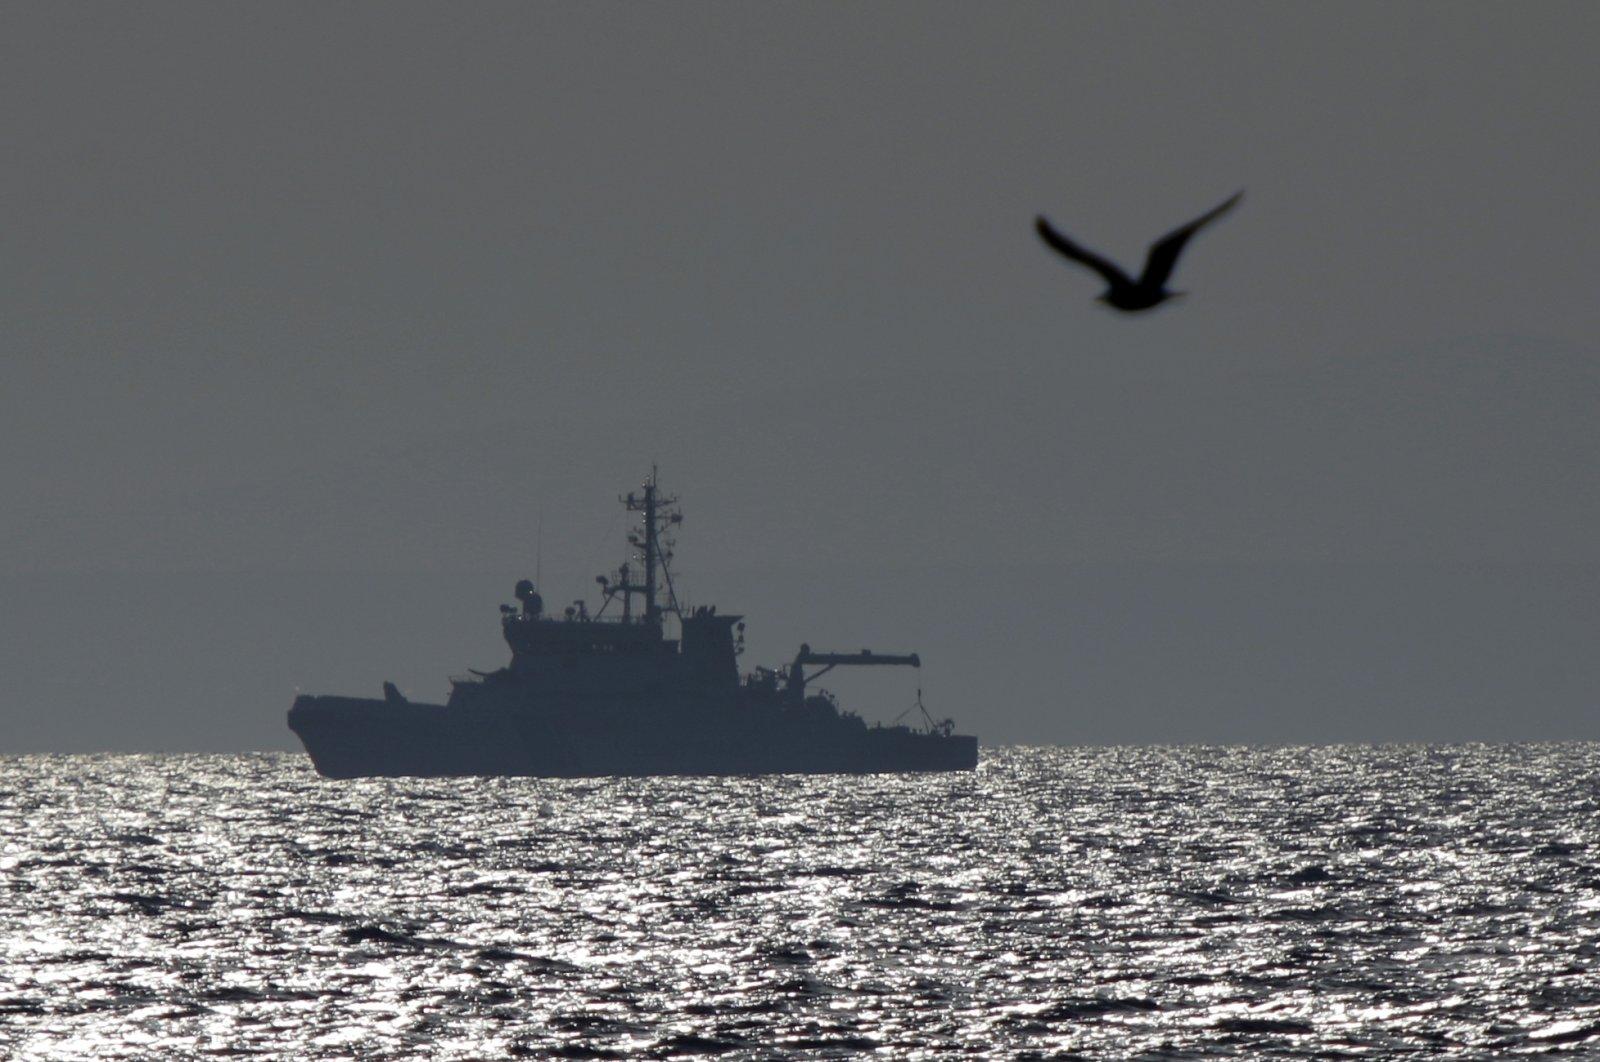 EU Frontex vessel Merikarhu patrols the Aegean Sea, between the eastern Greek Island of Agathonisi and the nearby Turkish shores, Feb. 29, 2016.  (AP File Photo)